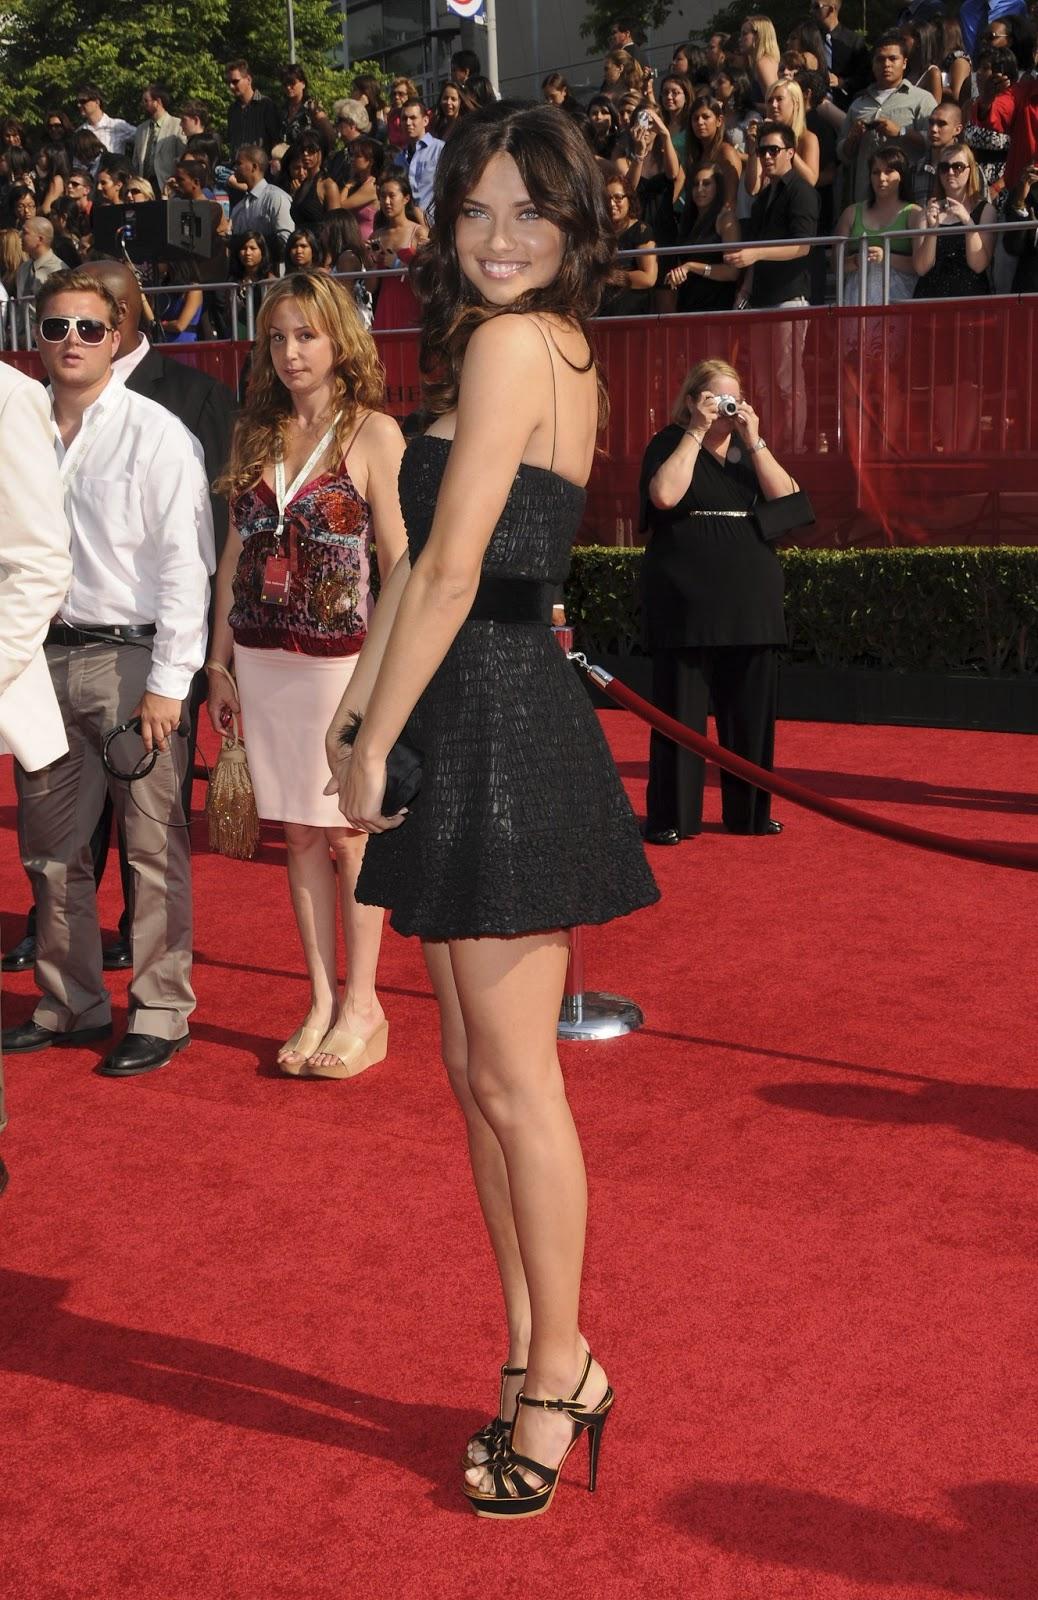 Adriana Lima naked celebrity pics - Celeb Nudes Photos